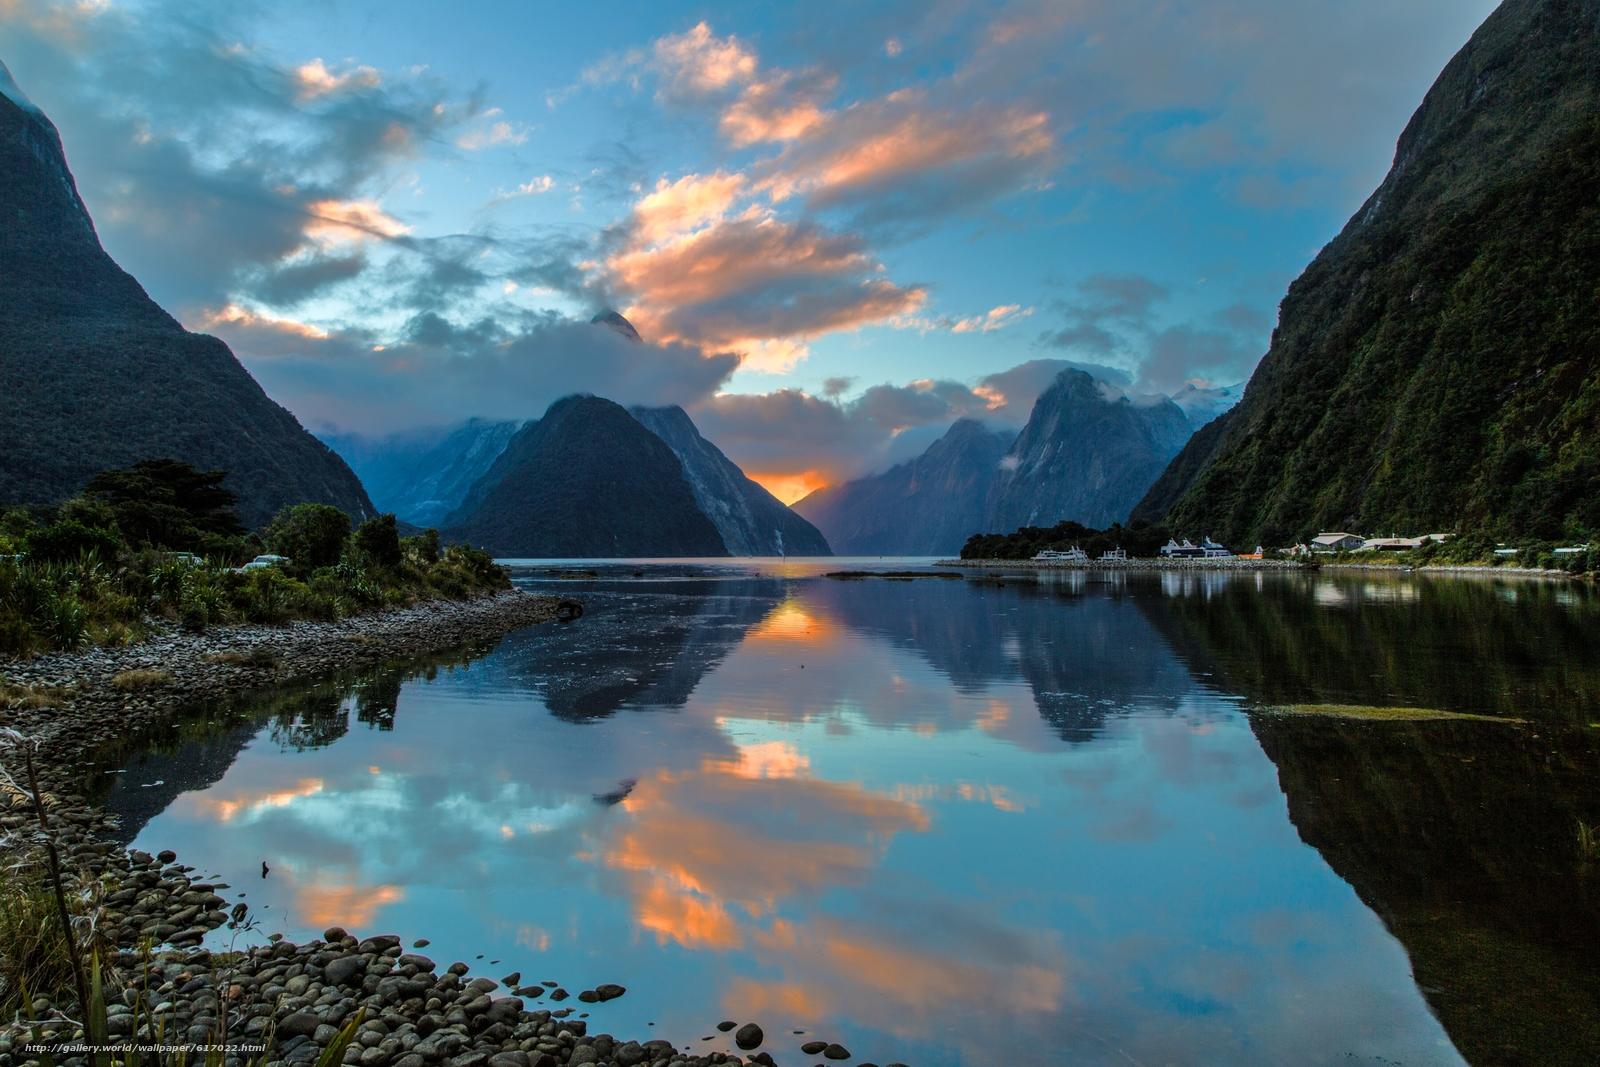 Video Nouvelle Zelande Gallery: Tlcharger Fond D'ecran Milford Sound, Nouvelle-Zélande